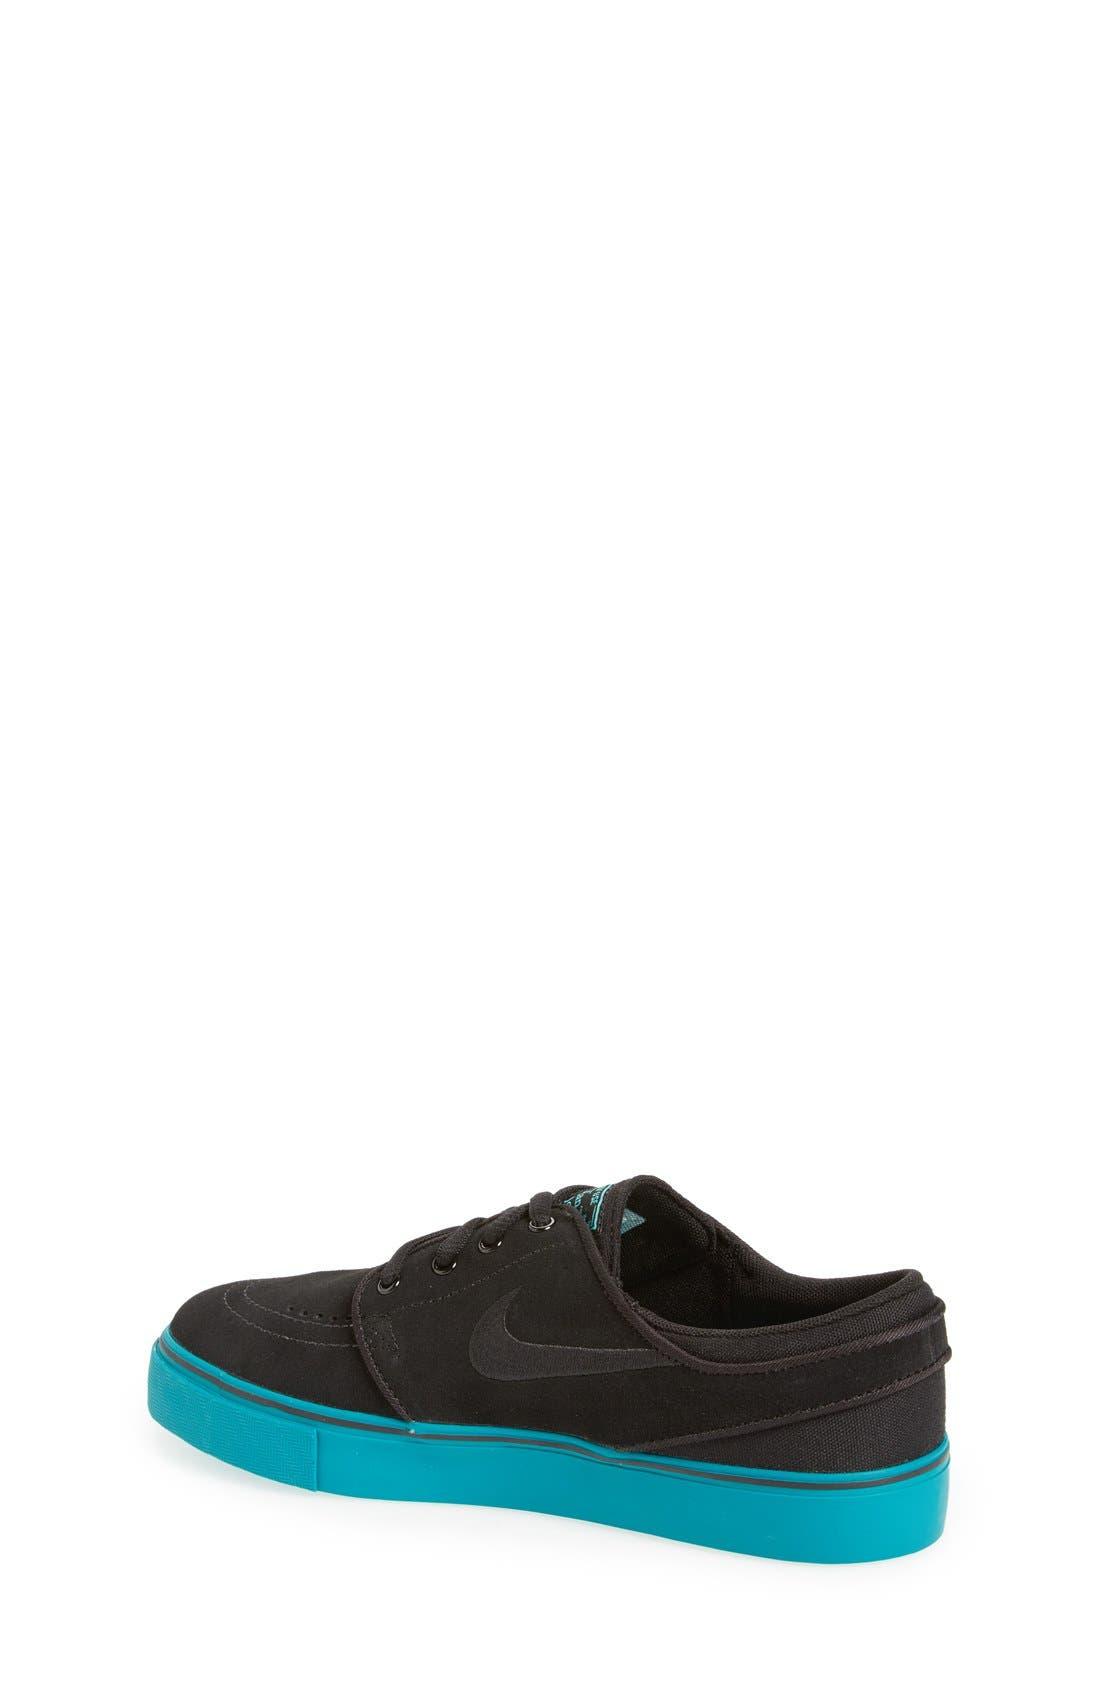 'Stefan Janoski' Sneaker,                             Alternate thumbnail 46, color,